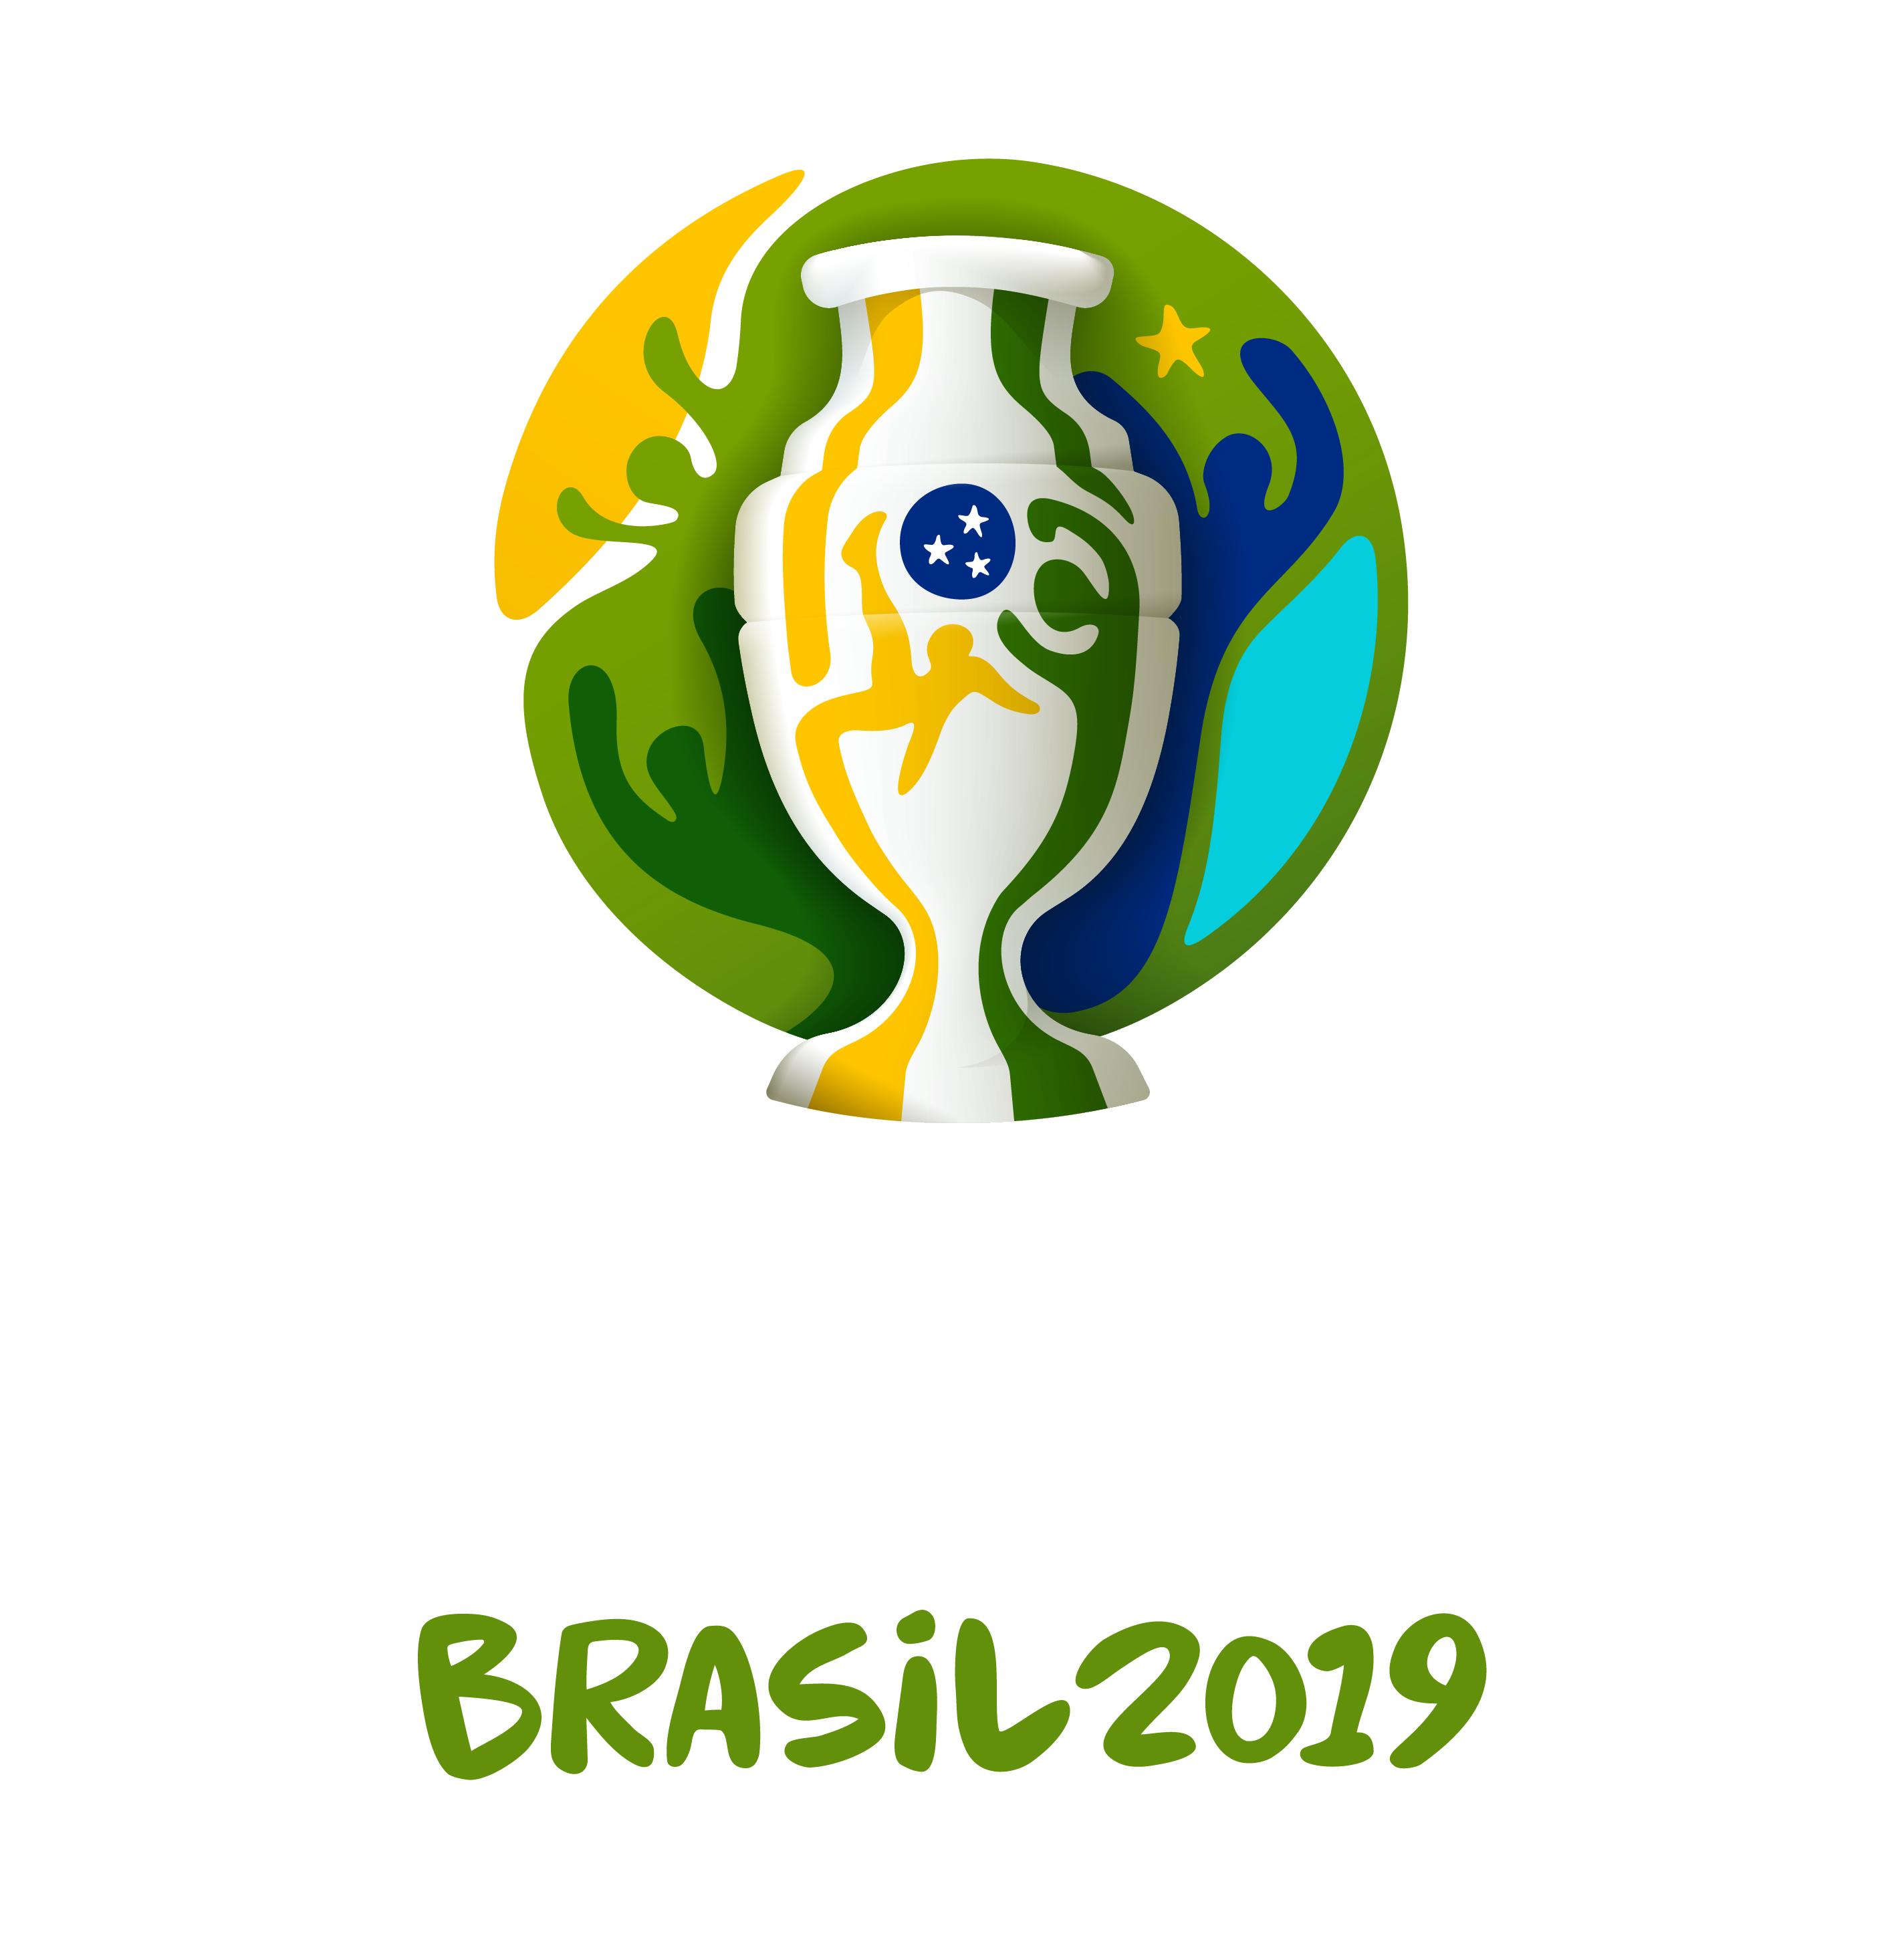 CONMEBOL Copa America